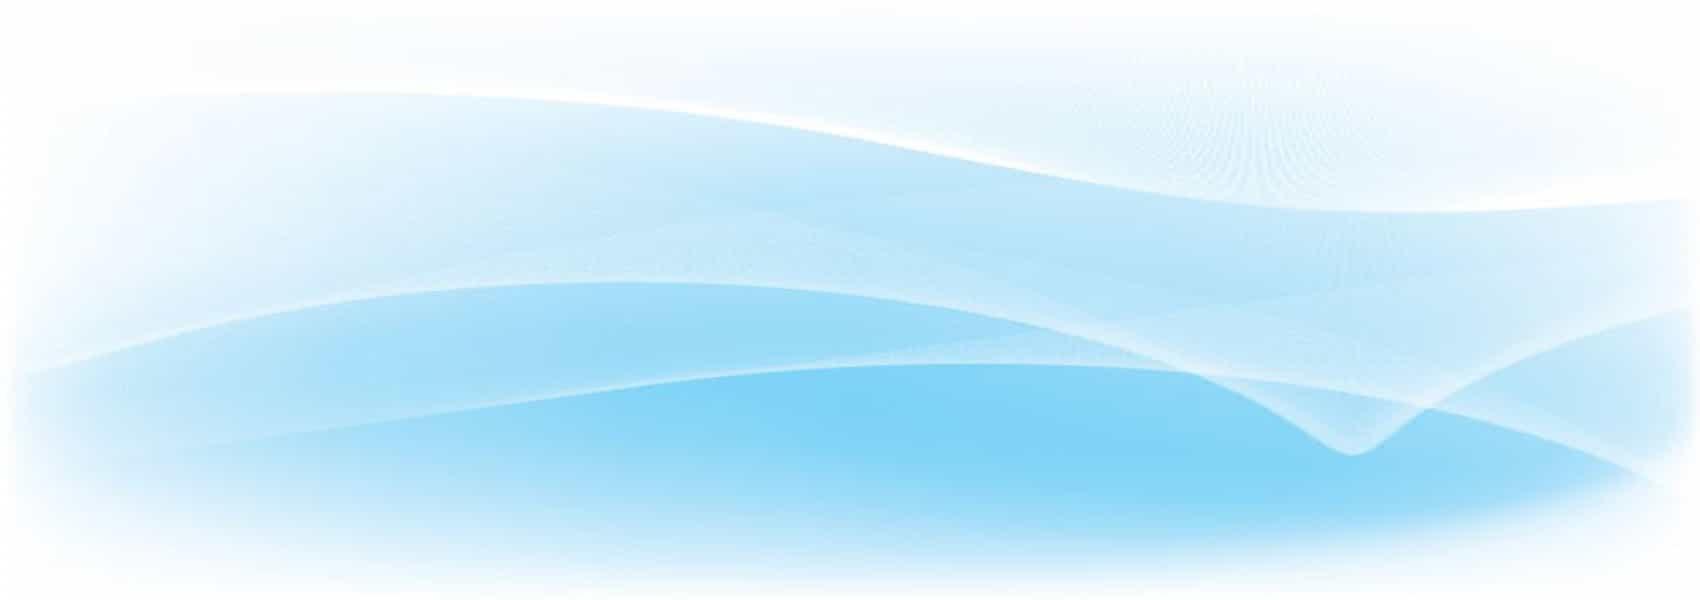 Fondo Azul Claro Internet Imagui